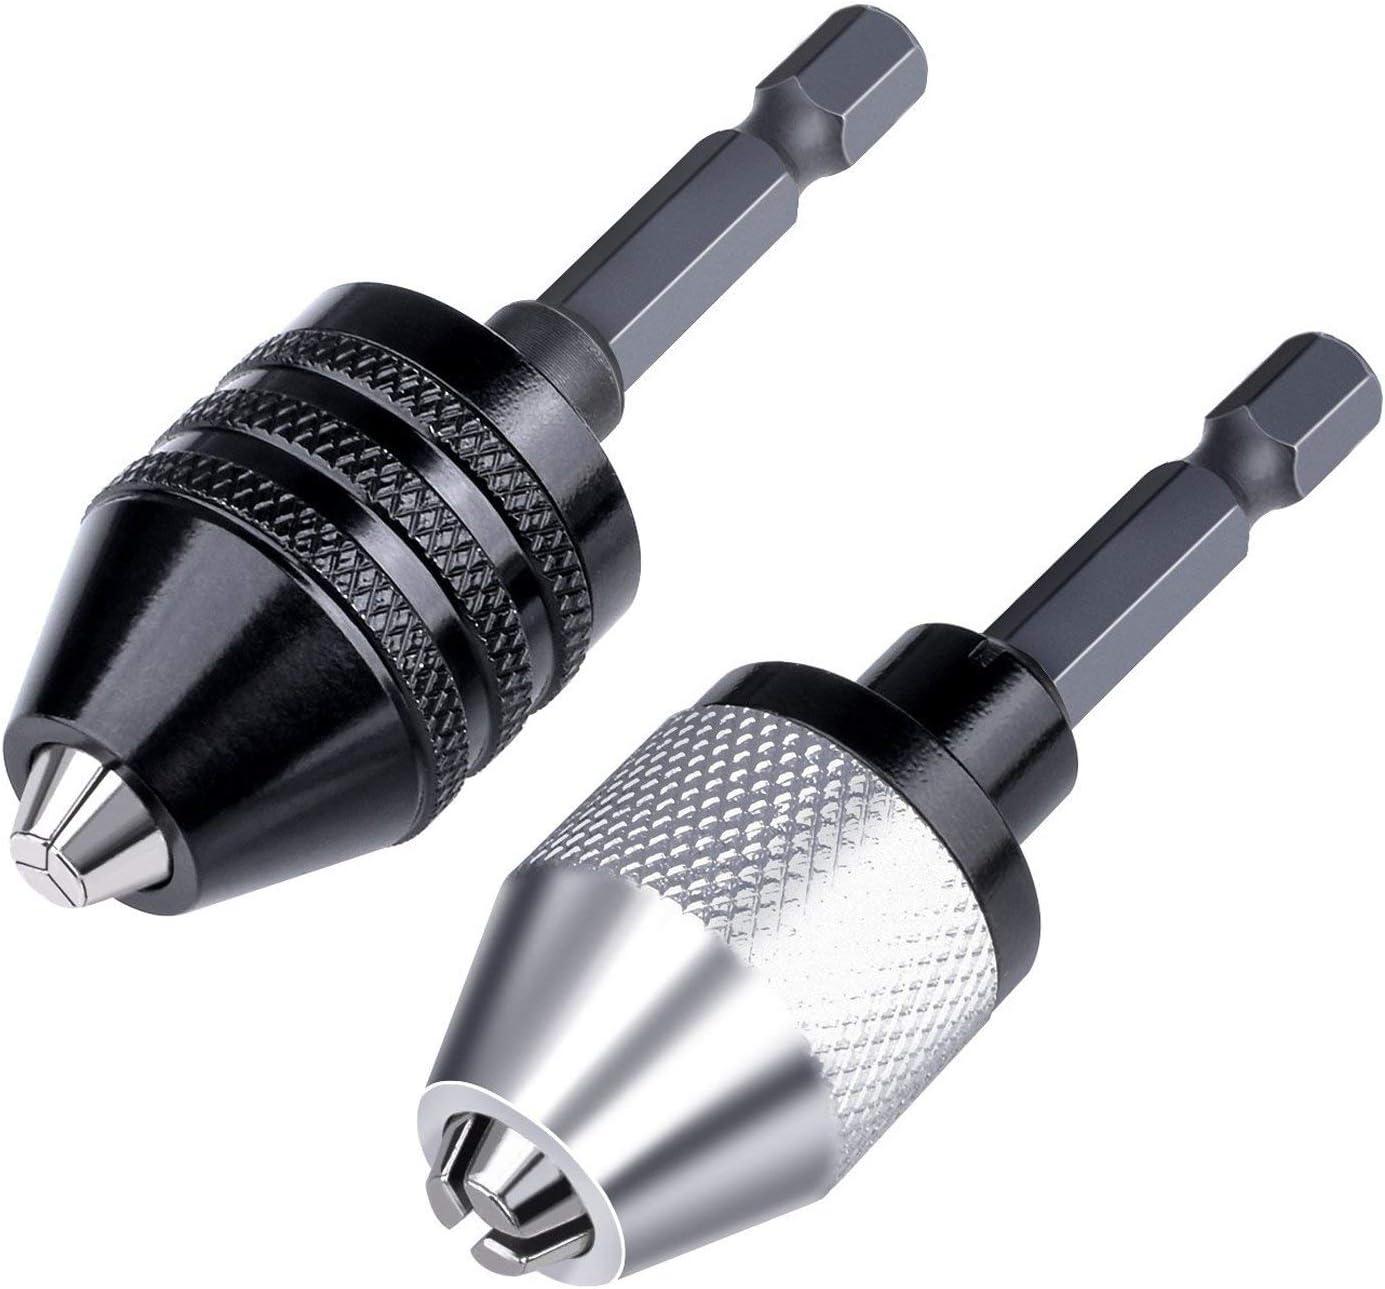 Keyless Adapter Chuck 0.8-10mm Drill Chuck Converter 3//8 24UNF Thread Quick Change Adapter with 1//4 Hex Shank Black